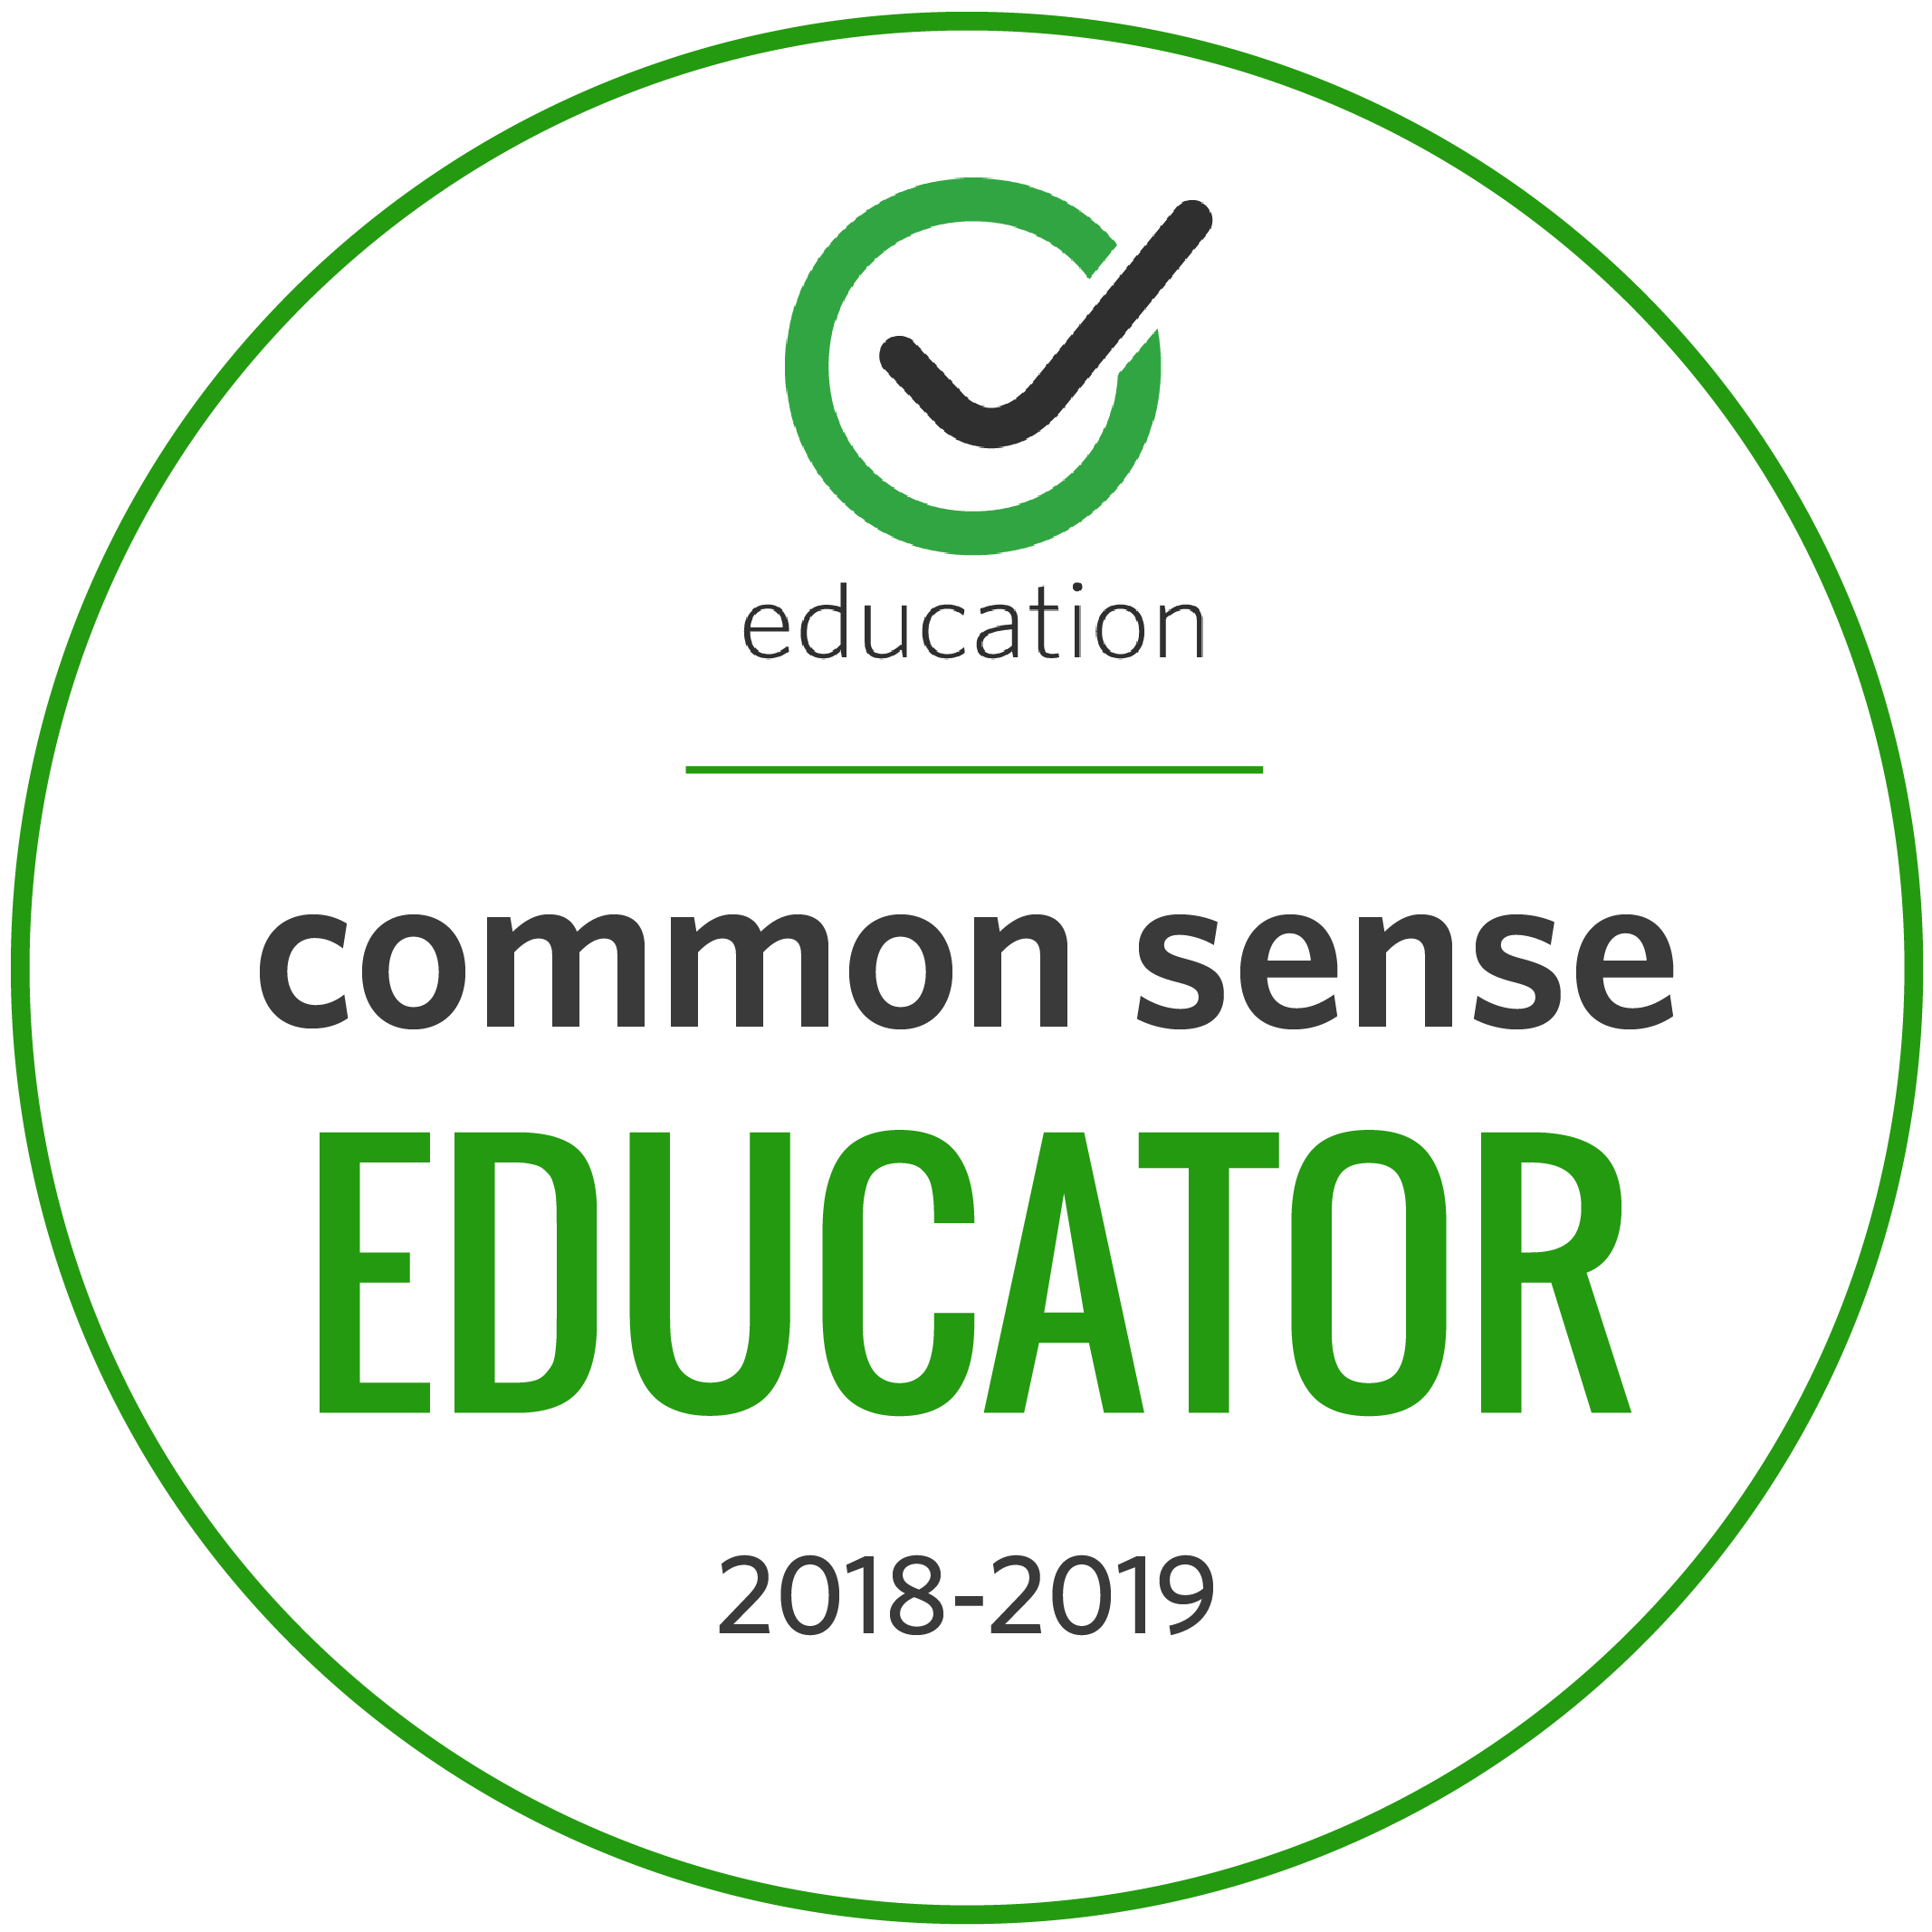 Common Sense Educator